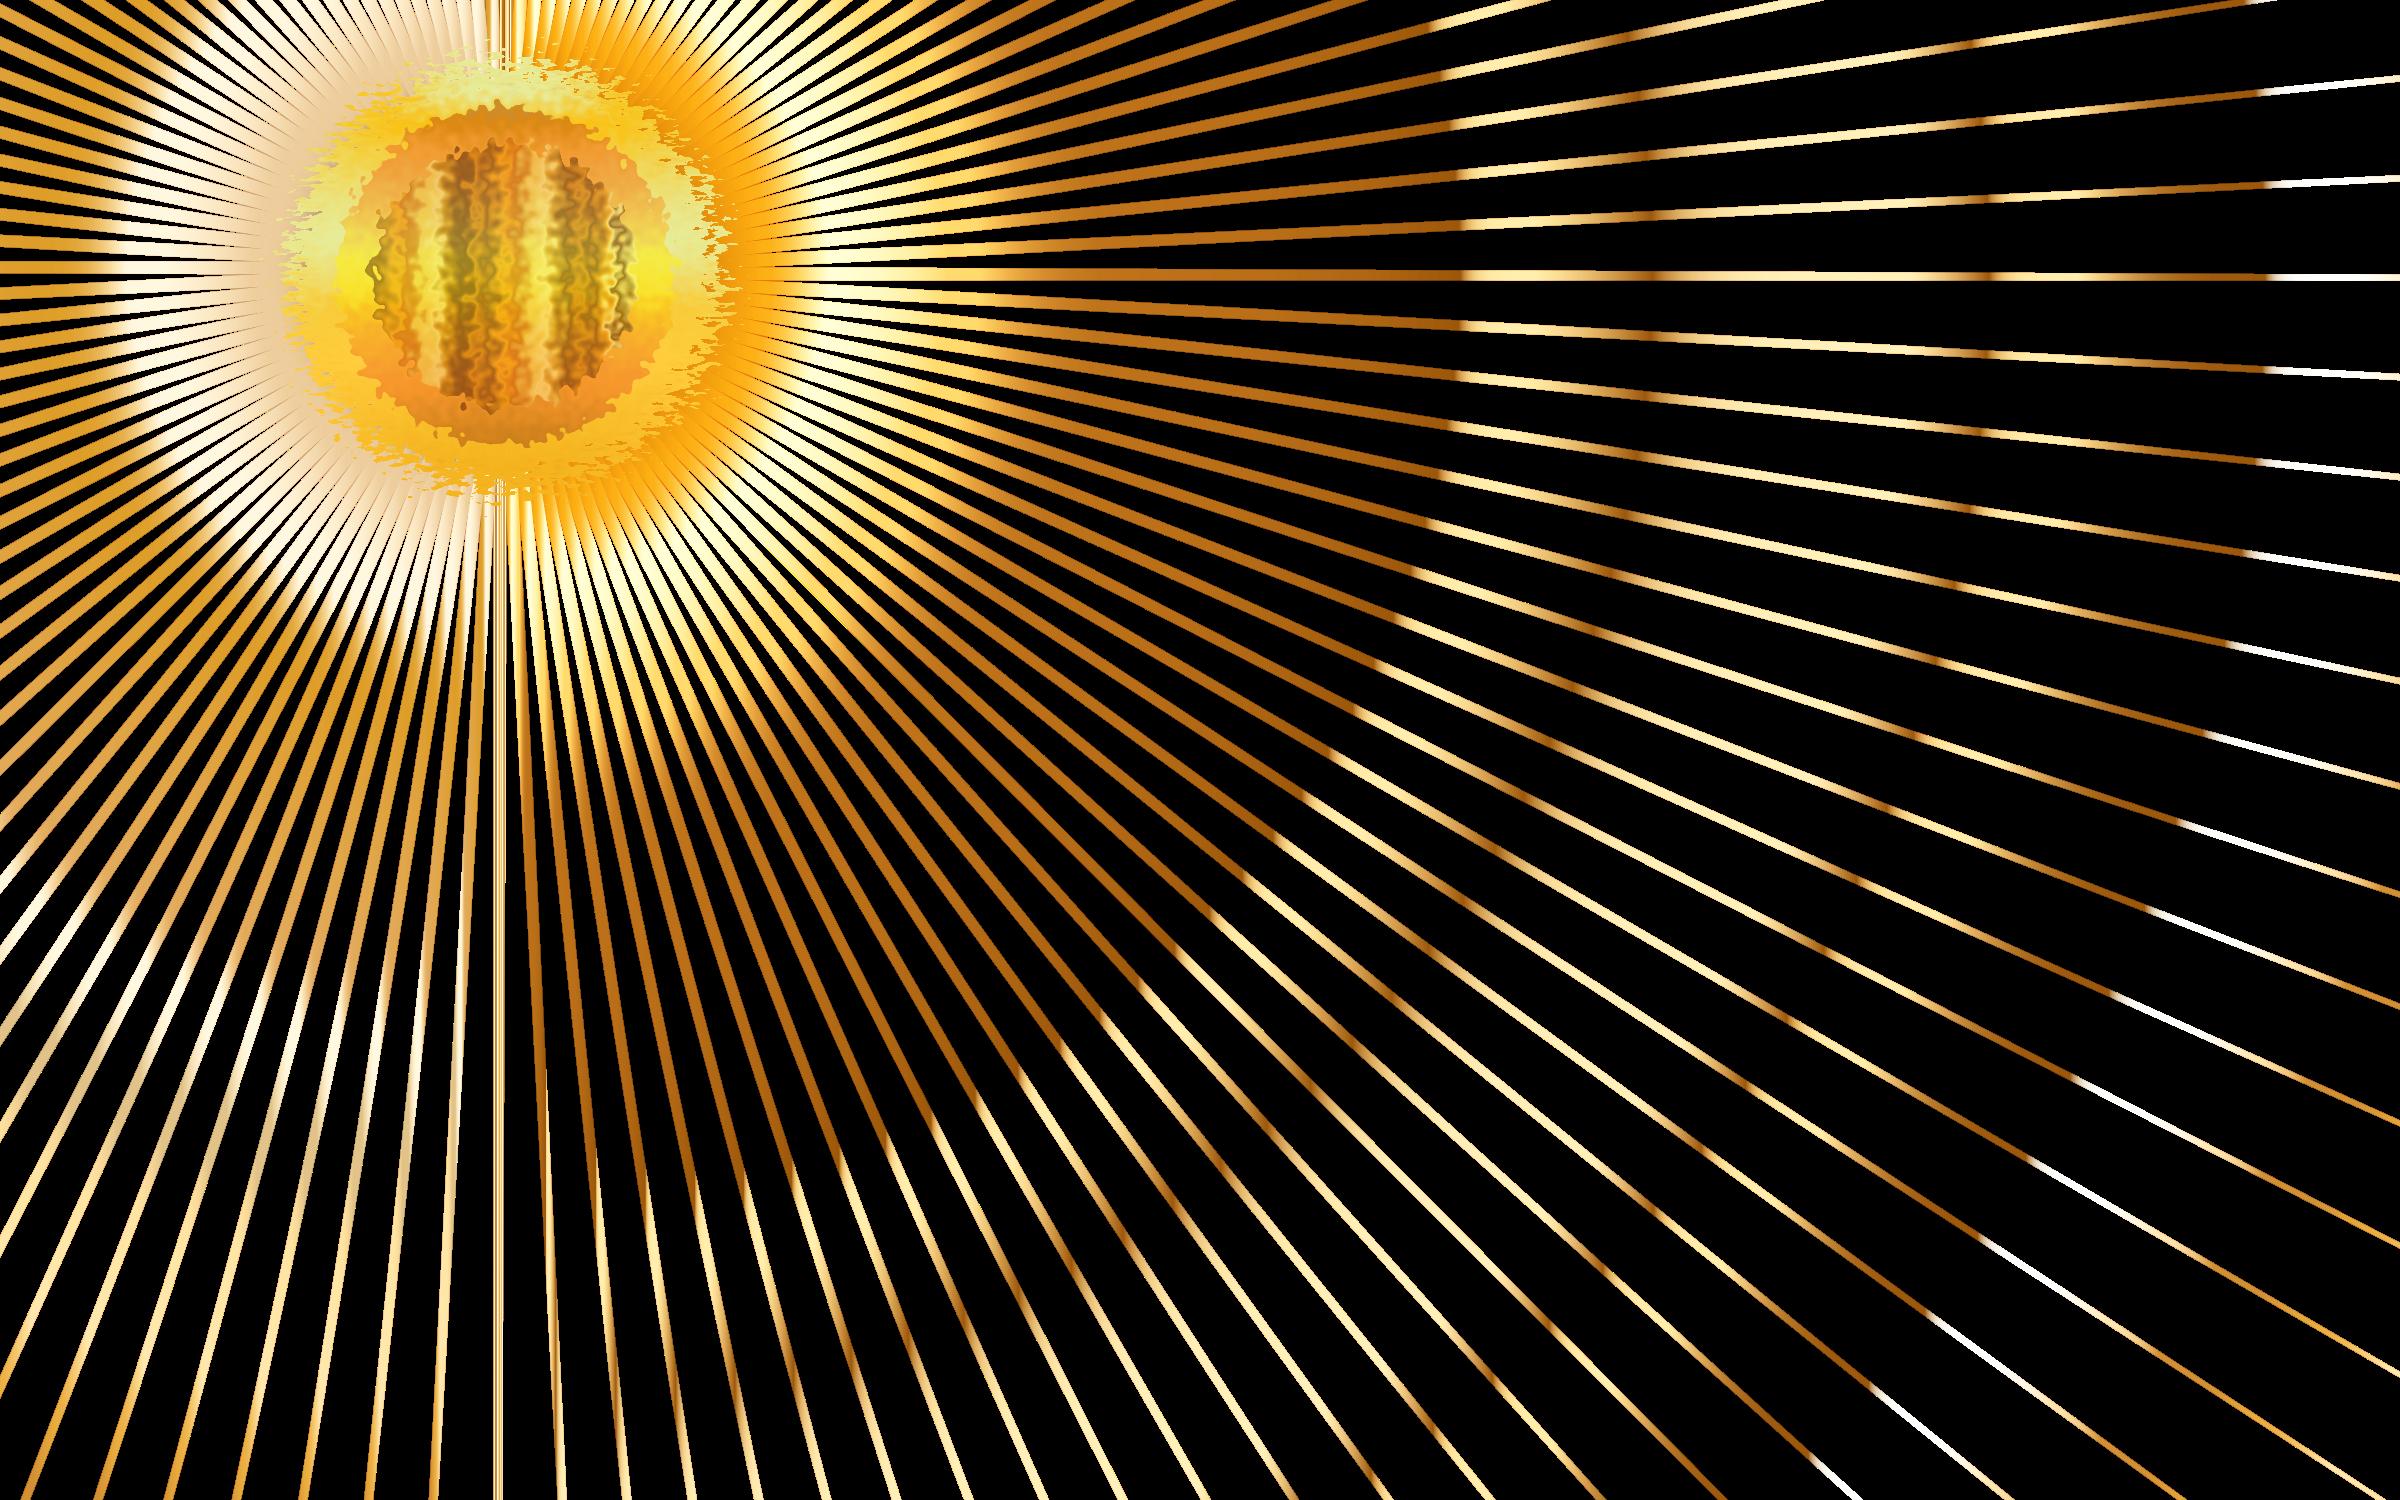 Beams no background big. Lights clipart sun rays